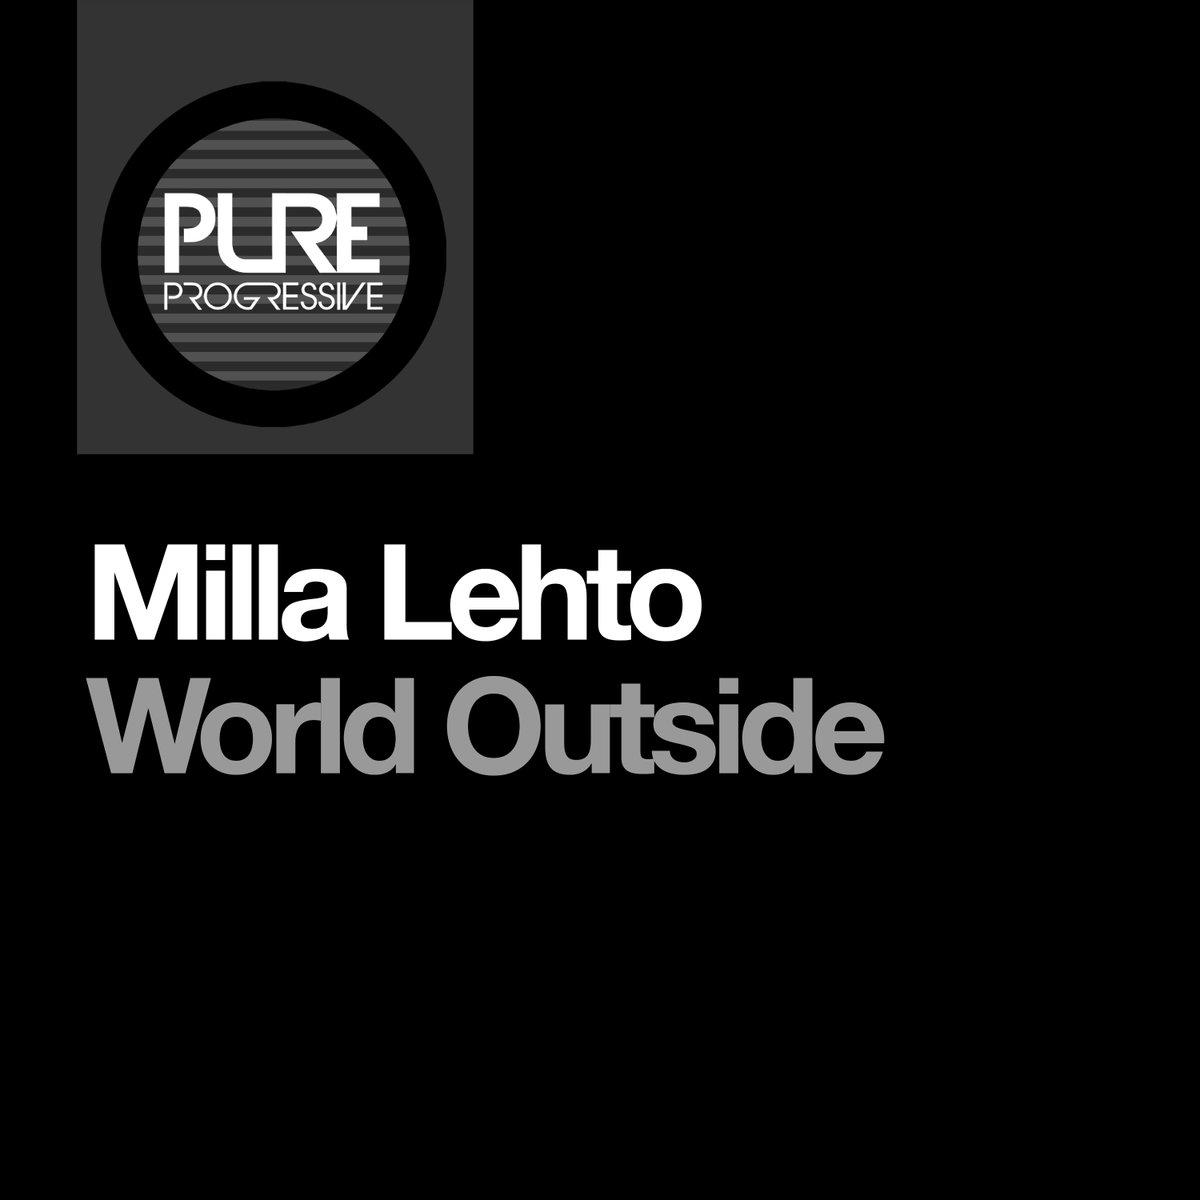 05. Milla Lehto - World Outside [Pure Progressive] #ProgressiveSelection #PureTrance #PTR254   Get it here: https://t.co/4pIo5EEzCX https://t.co/Rz1DOrFB73